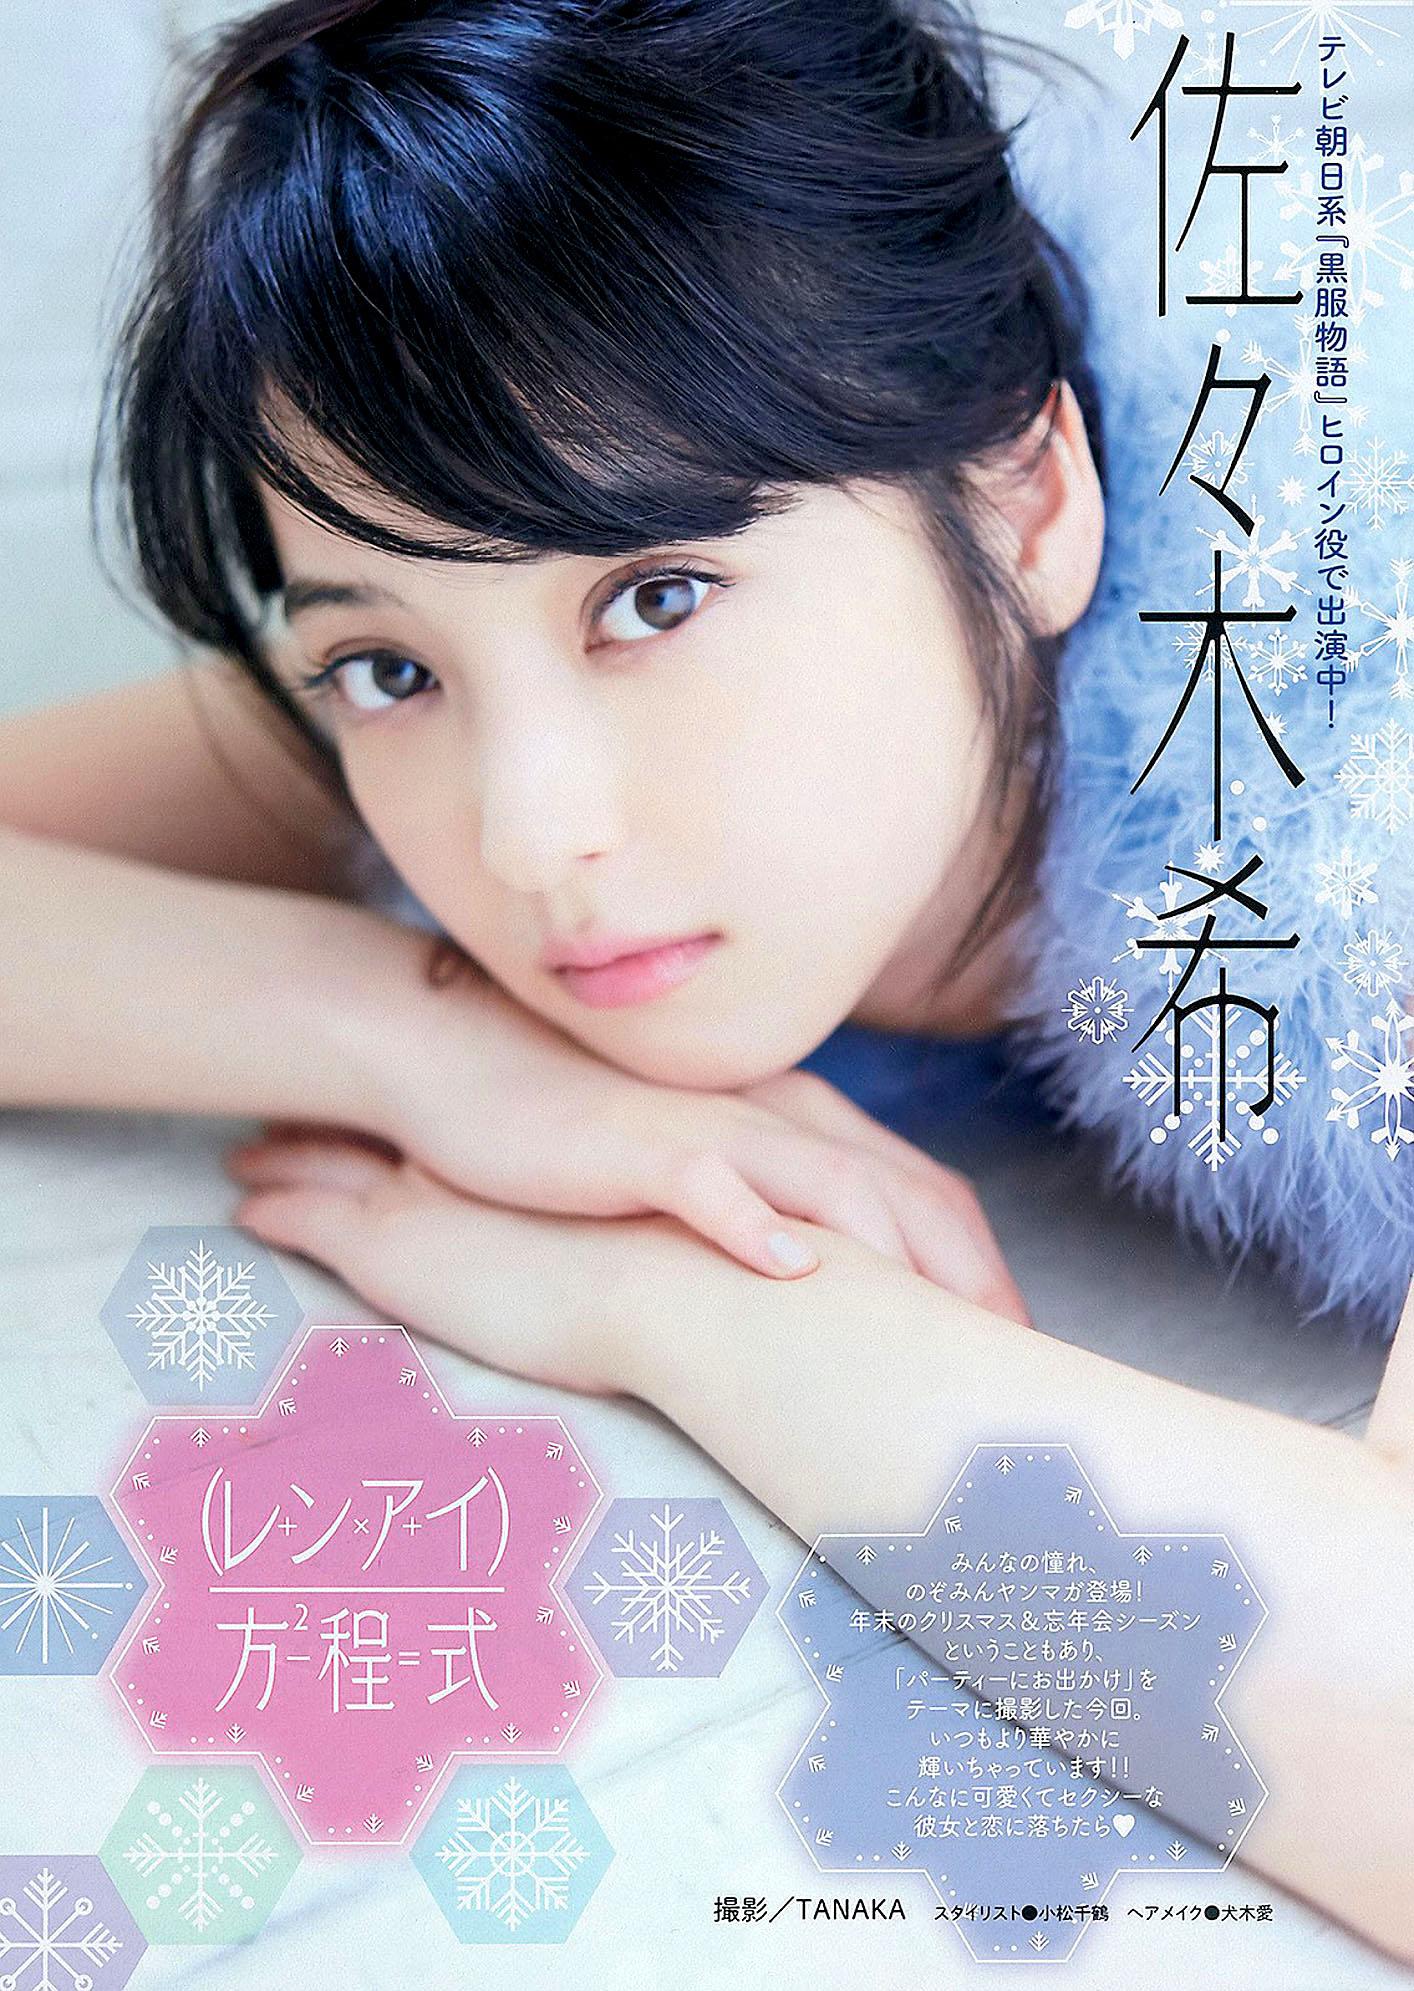 Sasaki Nozomi Young Magazine 150112 02.jpg